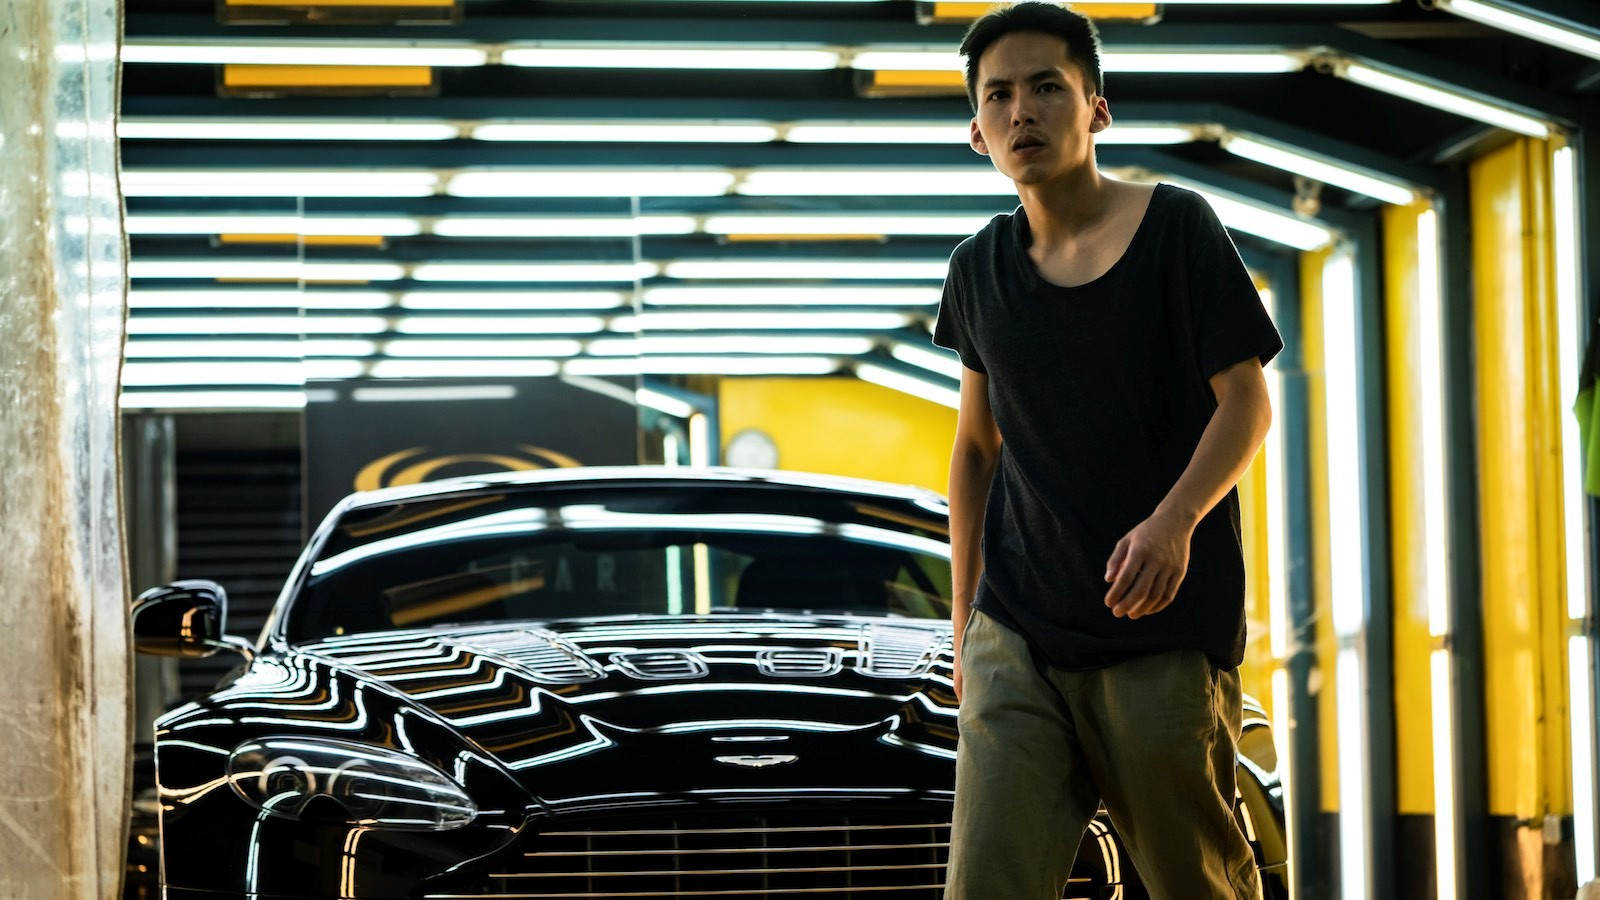 Buried on Netflix, Taiwanese Crime Epic 'A Sun' Demands Serious Oscar Consideration